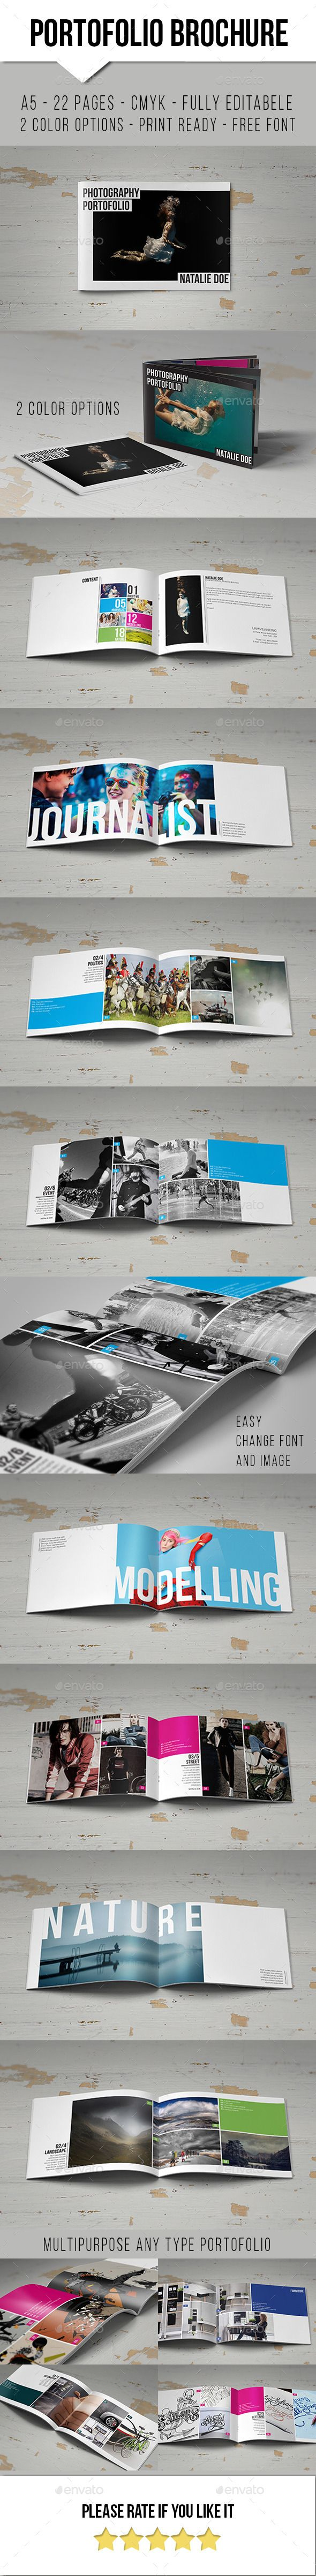 Simple Portofolio Brochure